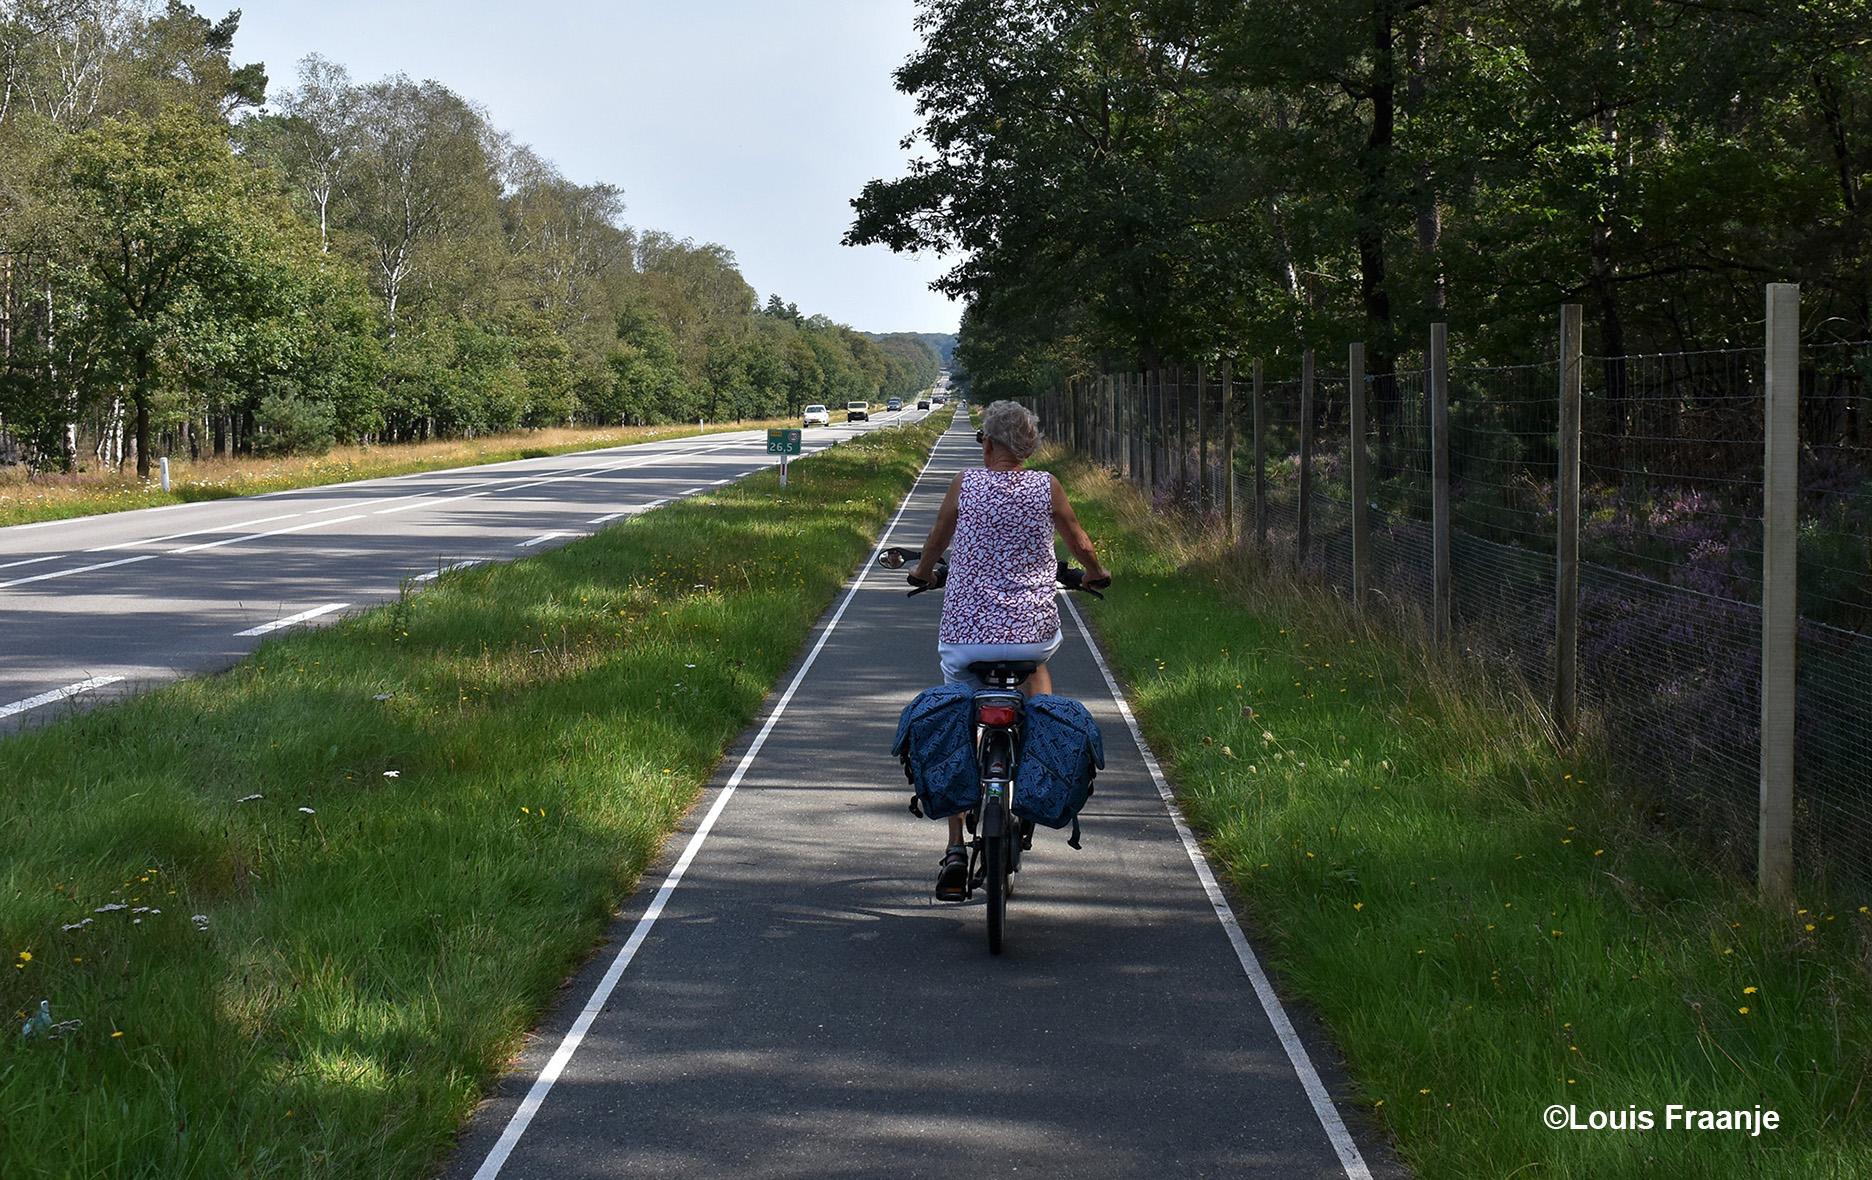 De lange klim naar boven richting Apeldoorn langs de Amersfoortseweg (N344)- Foto: ©Louis Fraanje